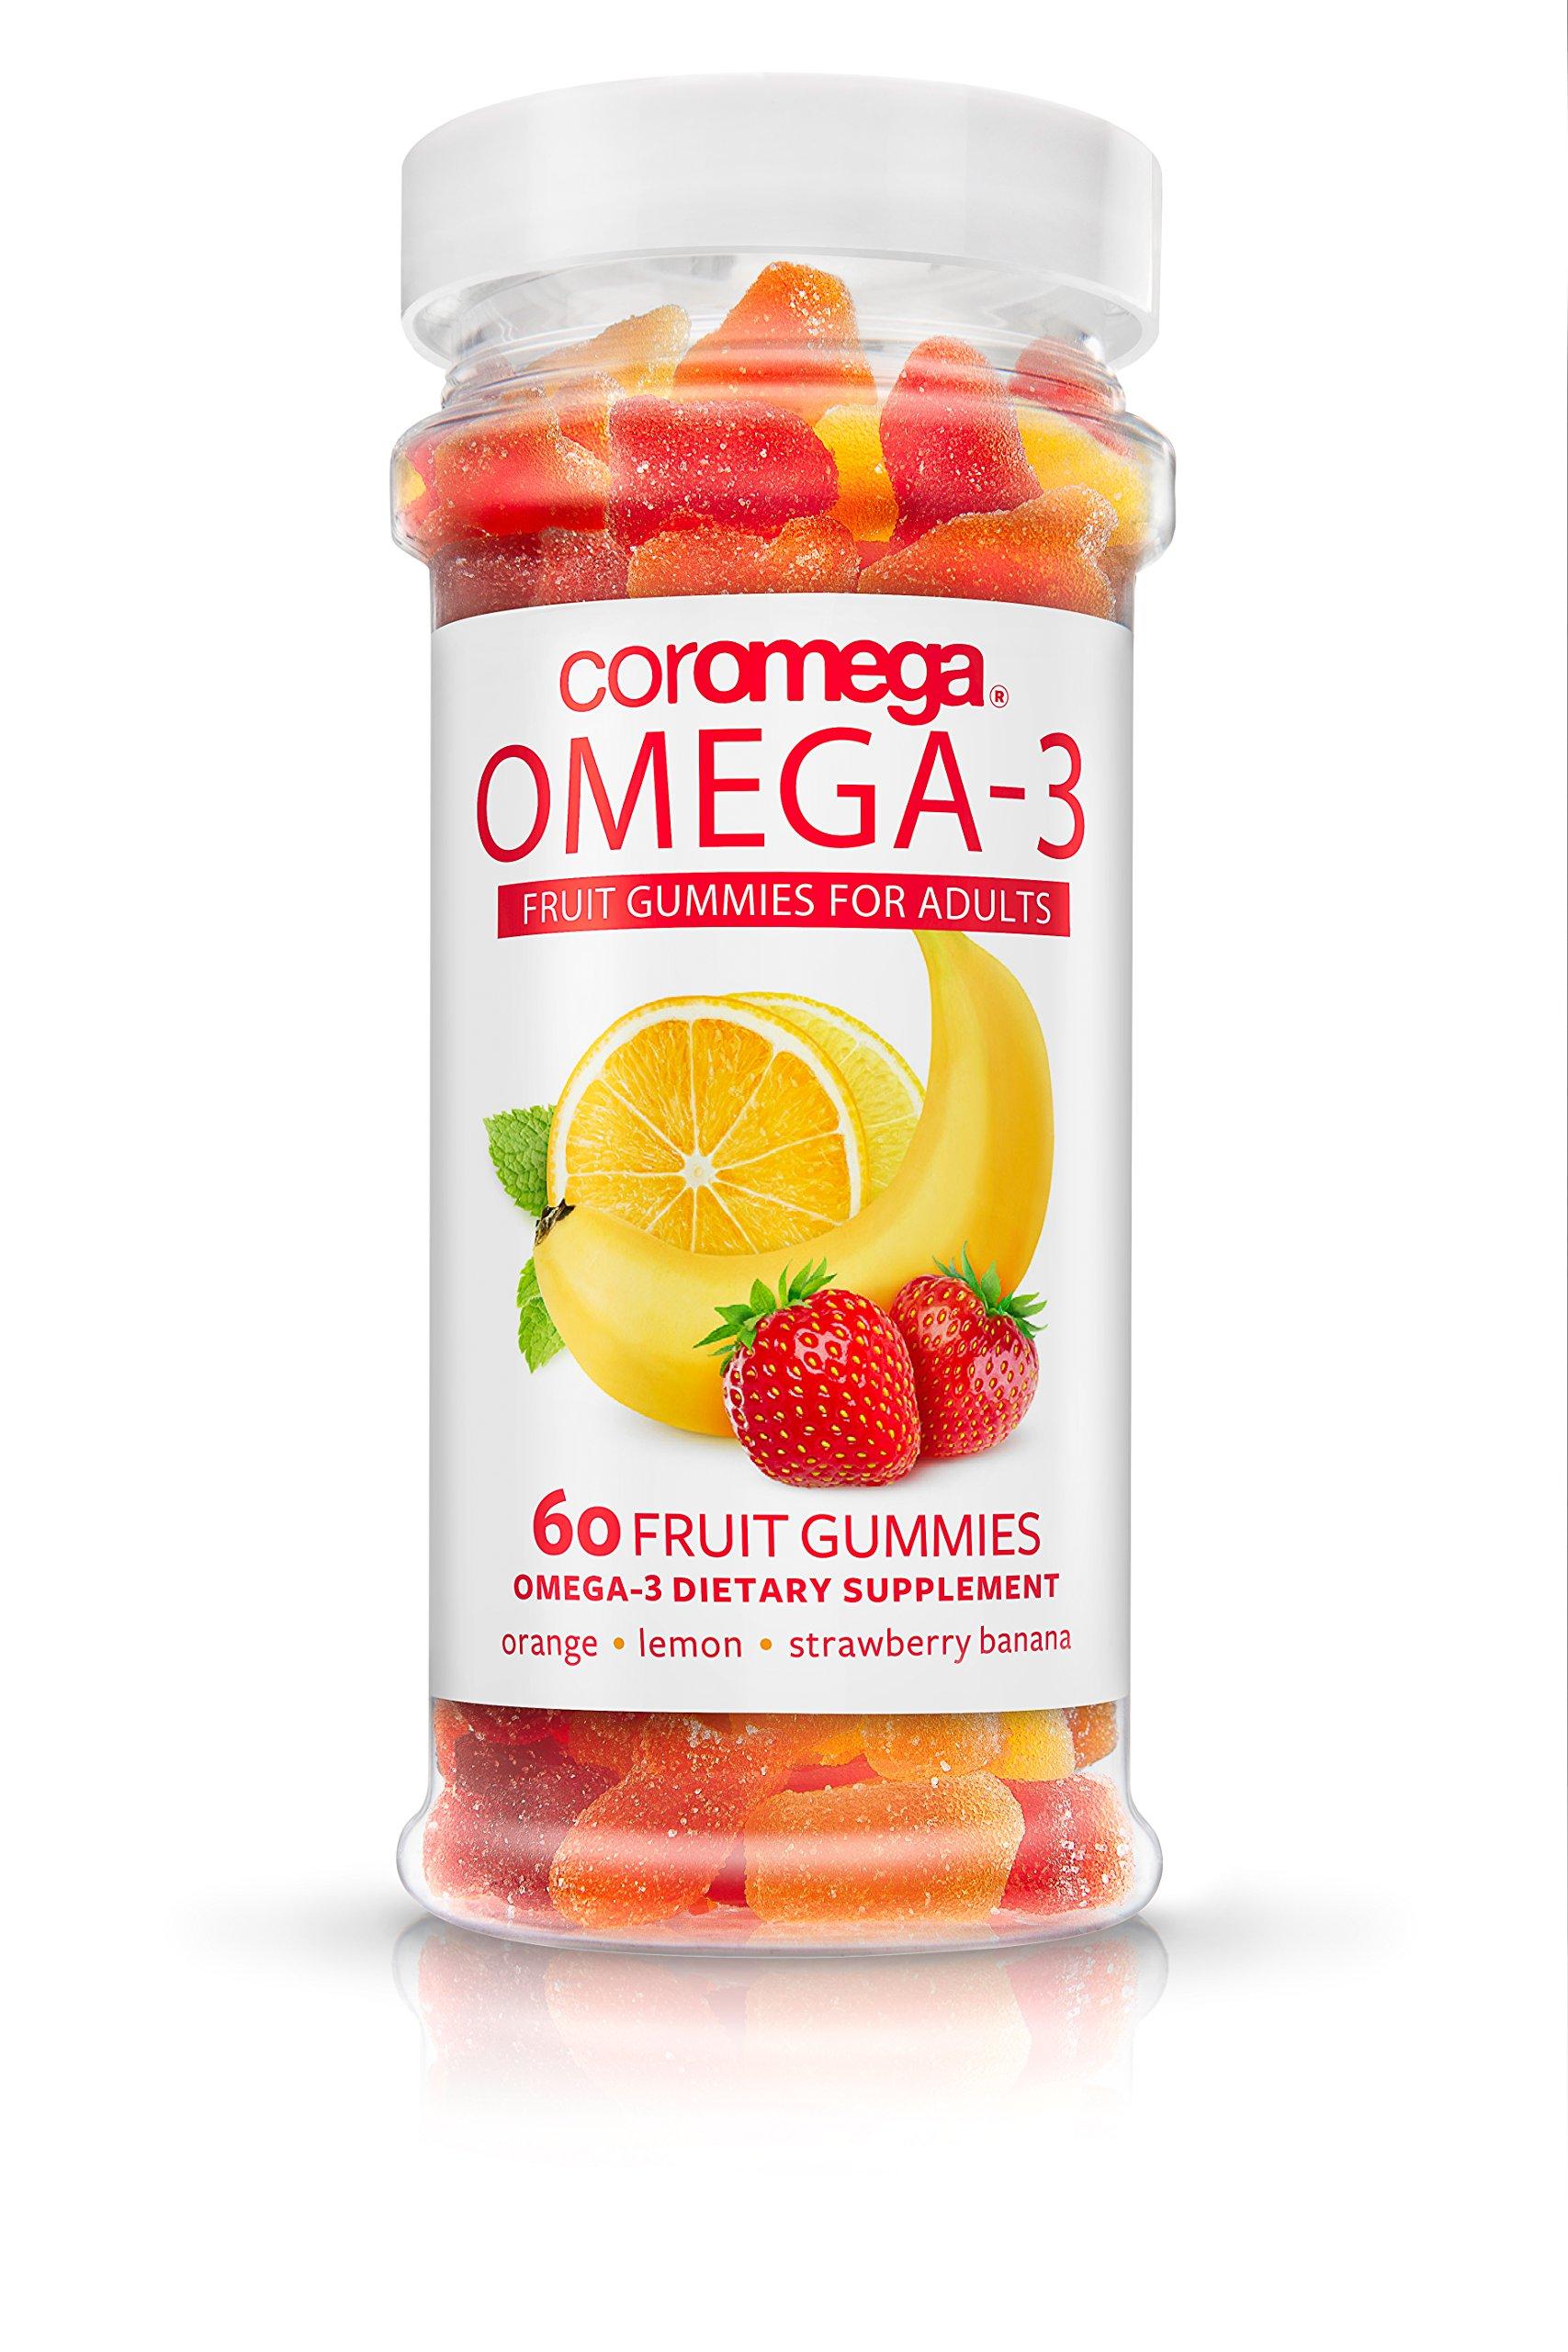 Coromega Omega-3 Fish Oil Adult Gummy Fruits, DHA and EPA, Assorted Fruit Flavors, 60-Count